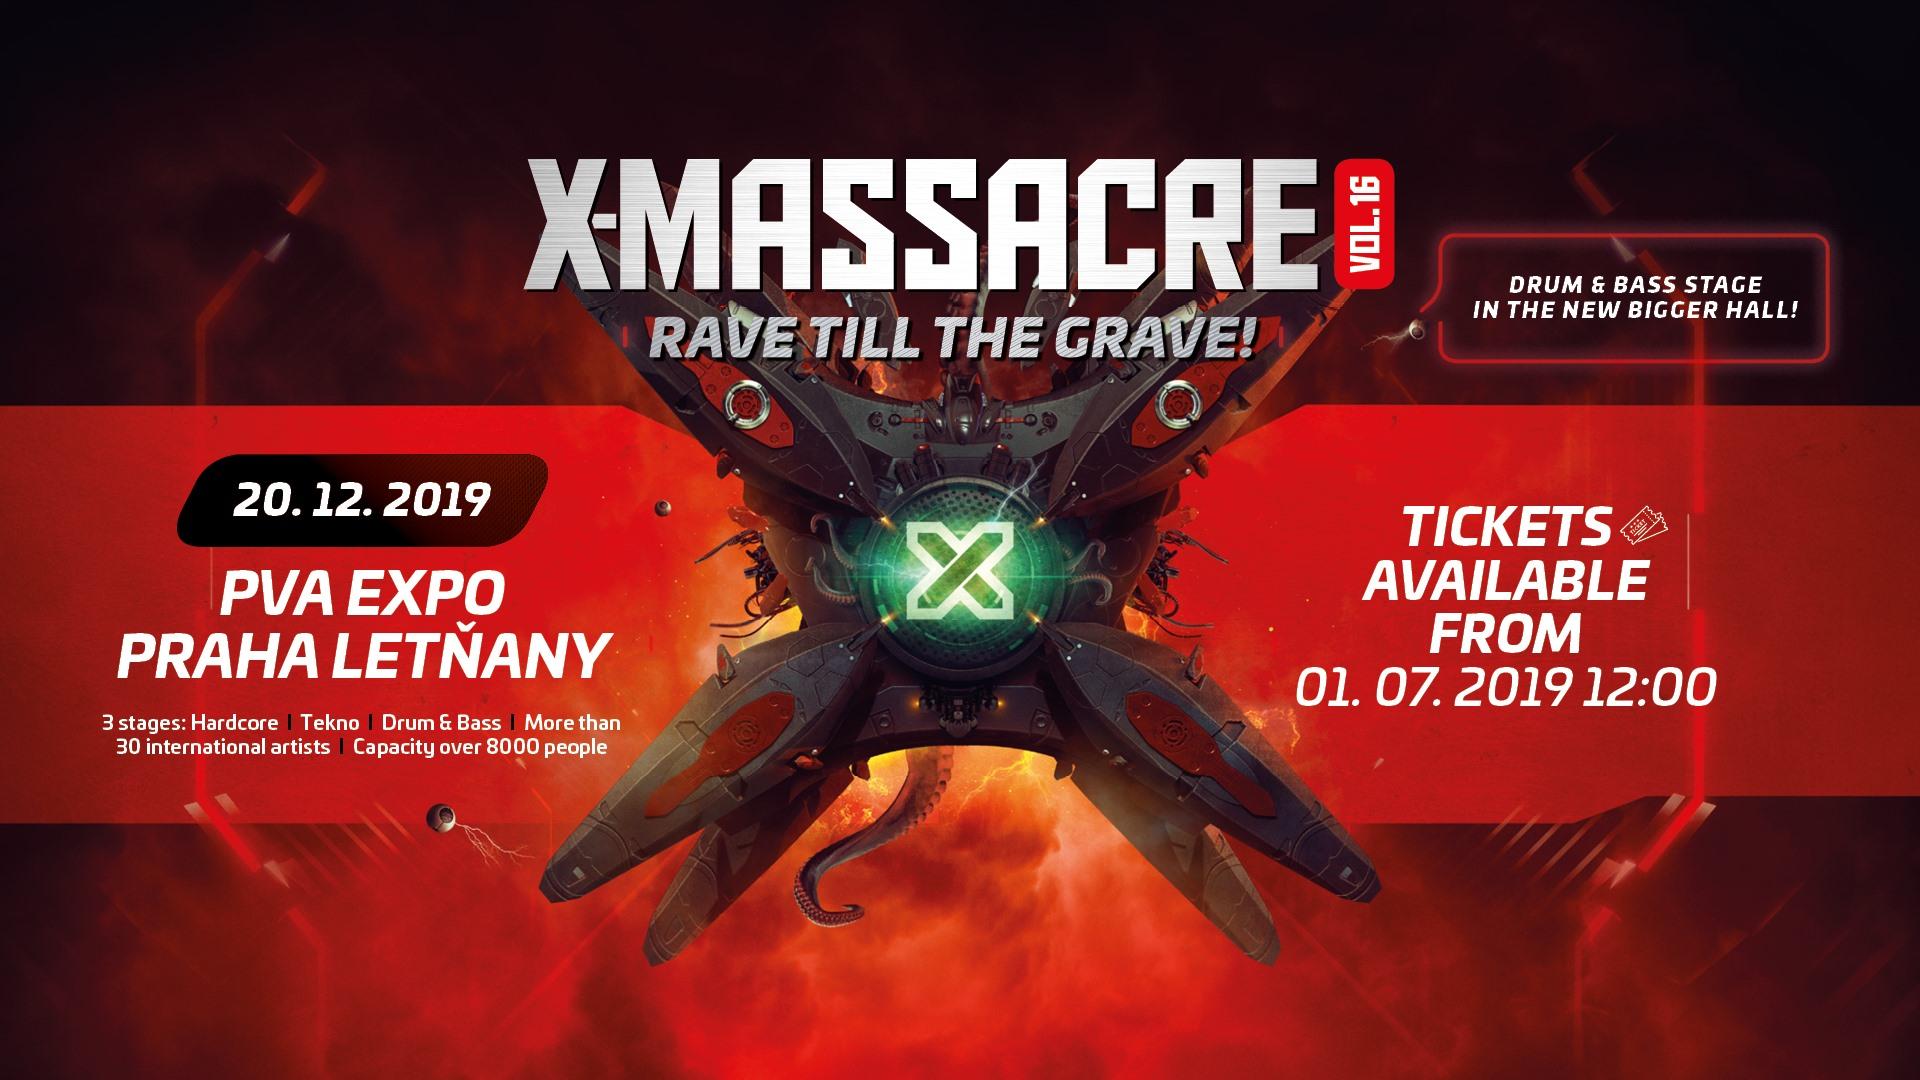 X-mAssAcRe 2019